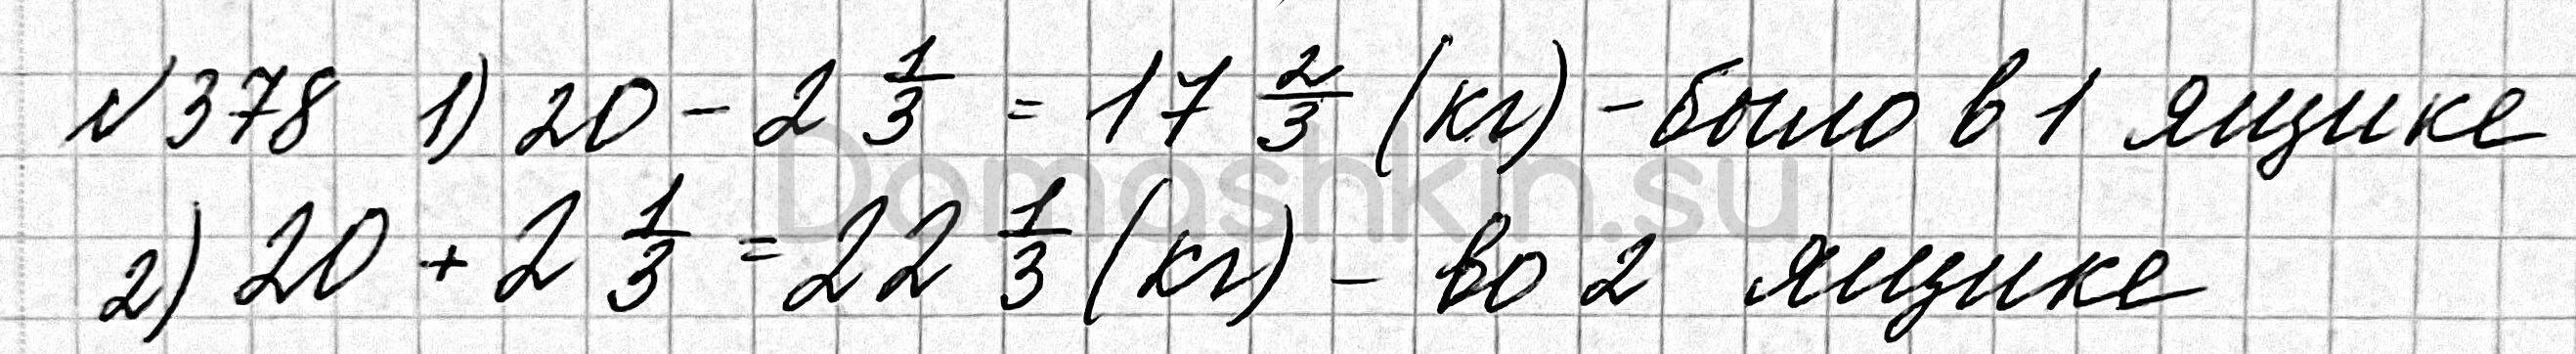 Математика 6 класс учебник Мерзляк номер 378 решение